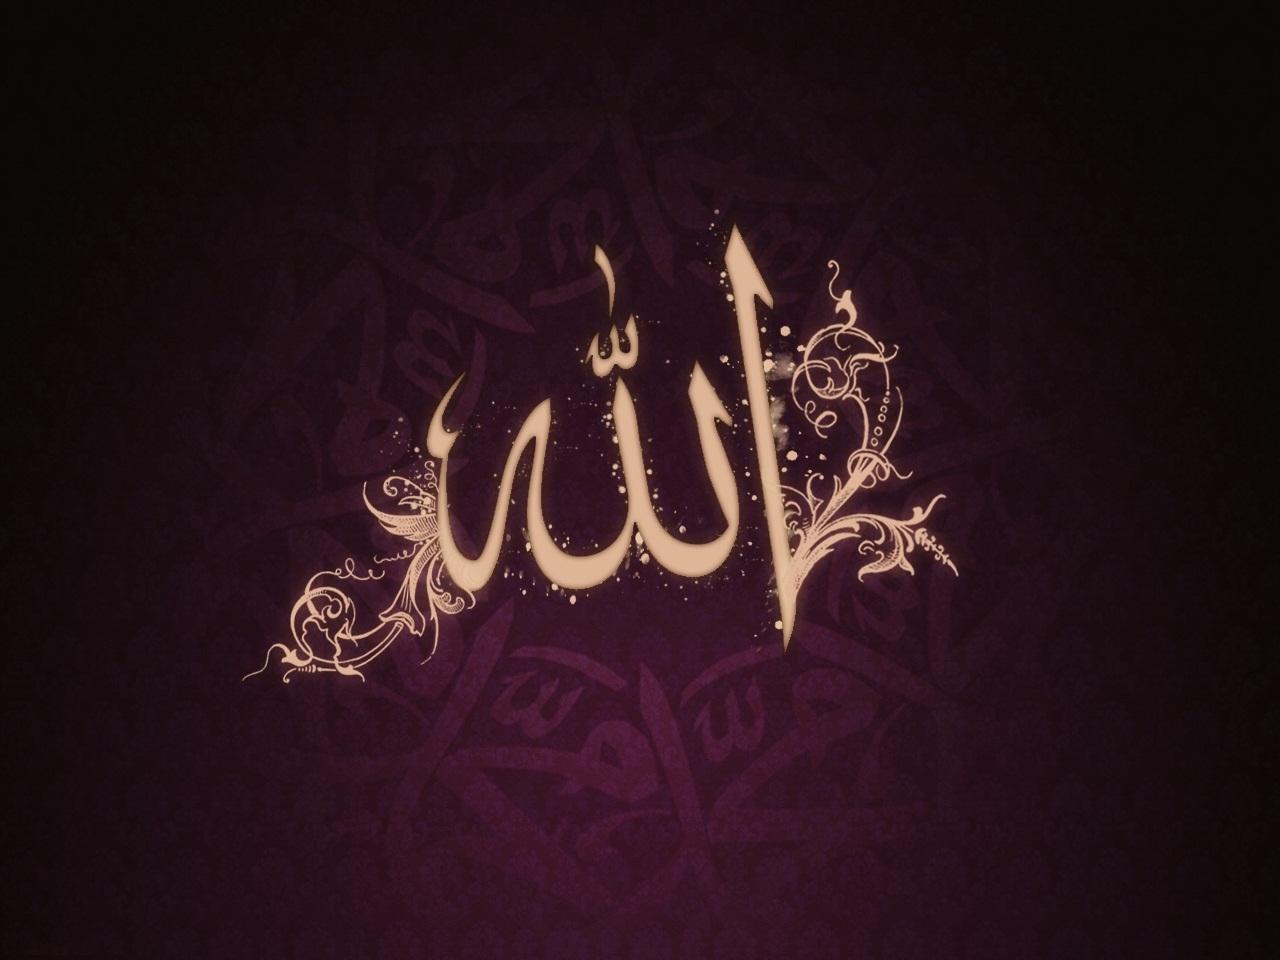 http://3.bp.blogspot.com/-La-g15Ab0_k/UQEPwSxy_XI/AAAAAAAADqw/iB-1V5eZFtY/s1600/Lord+Allah+HD+Wallpapers+2.jpg